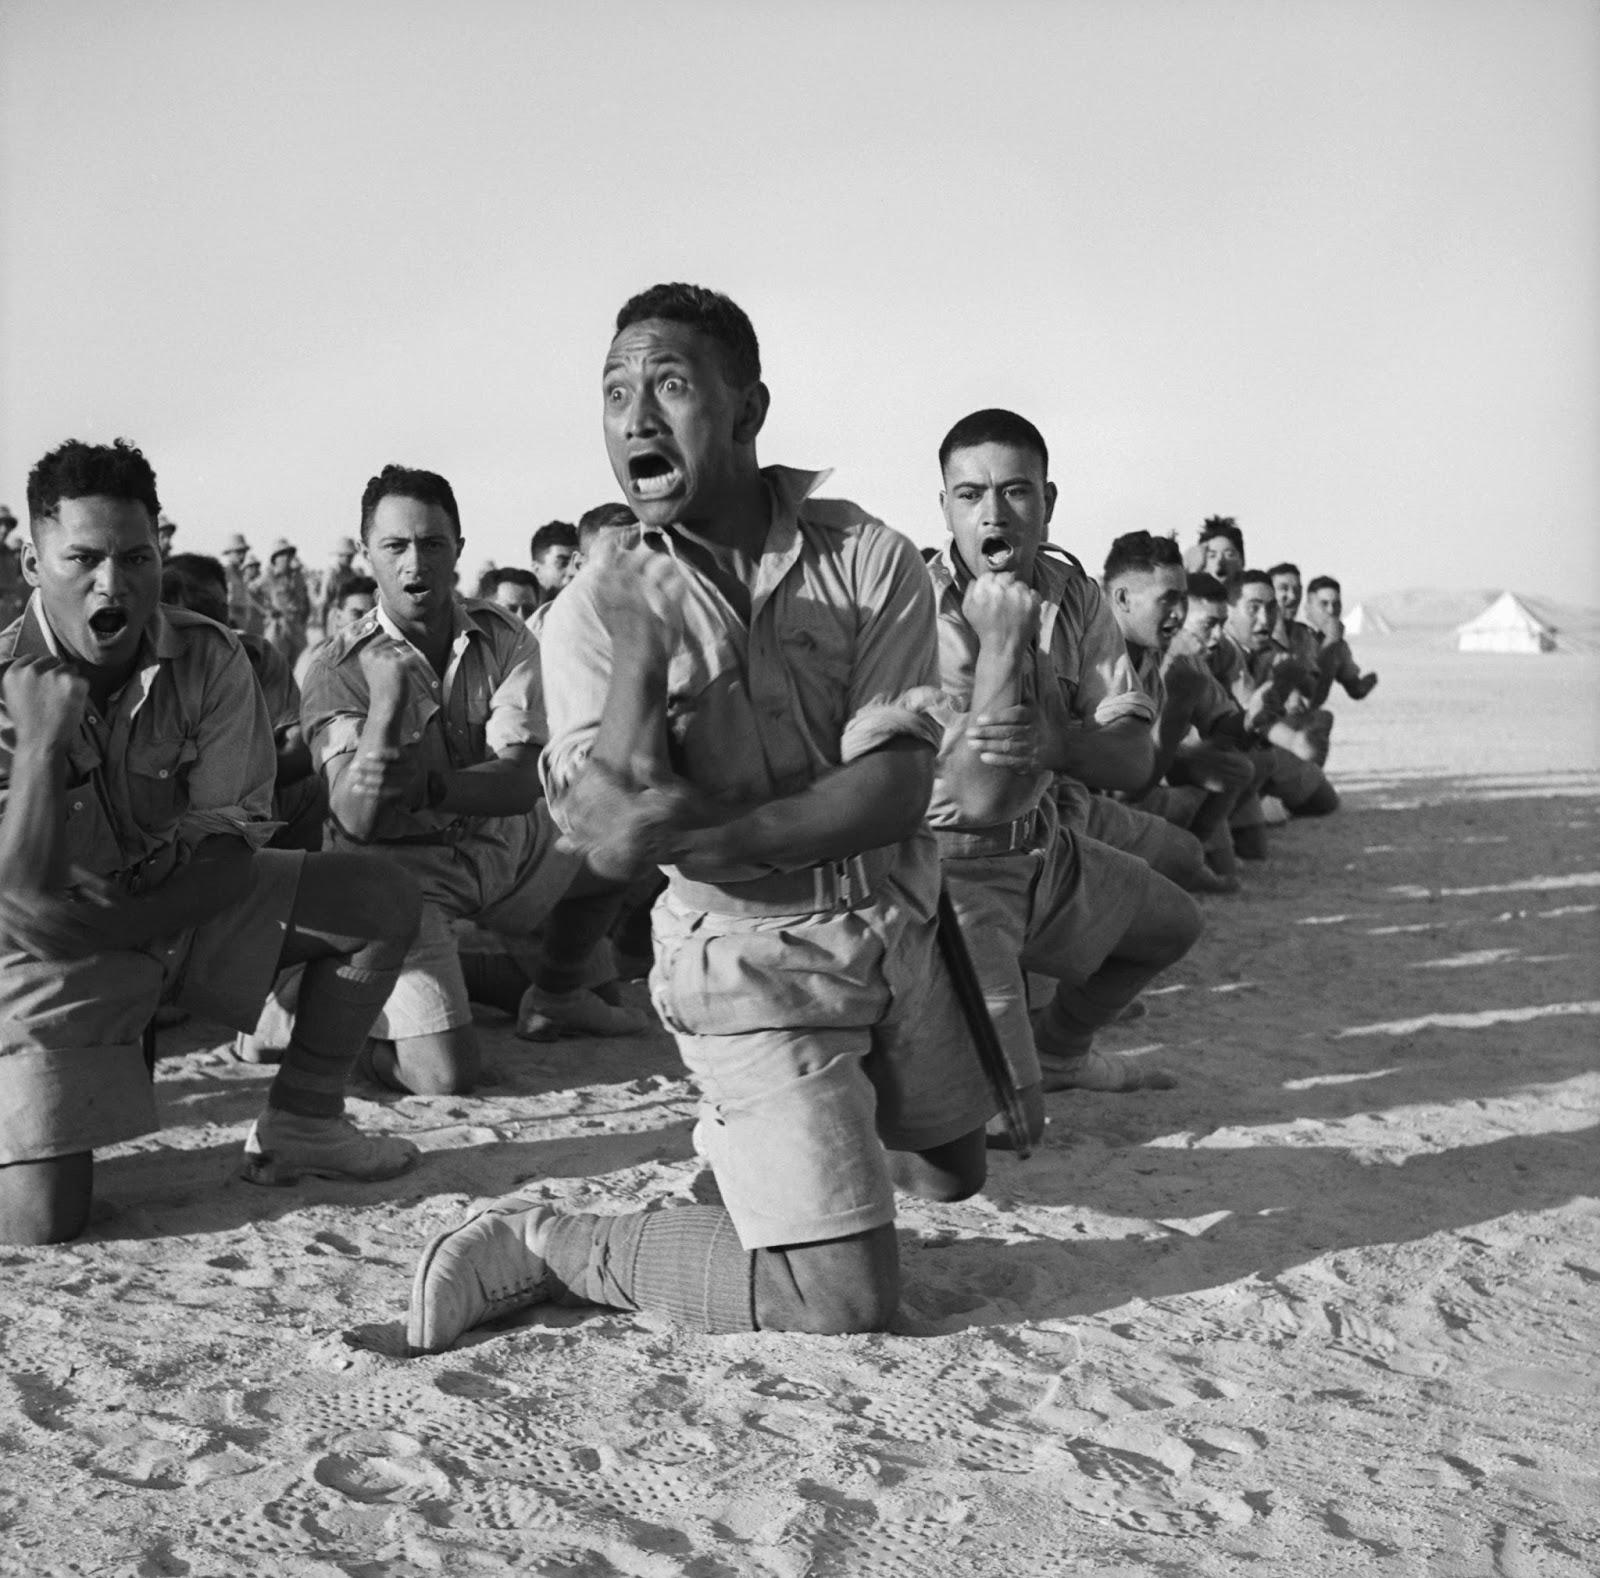 e_003261_e_maoris_in_north_africa_july_1941